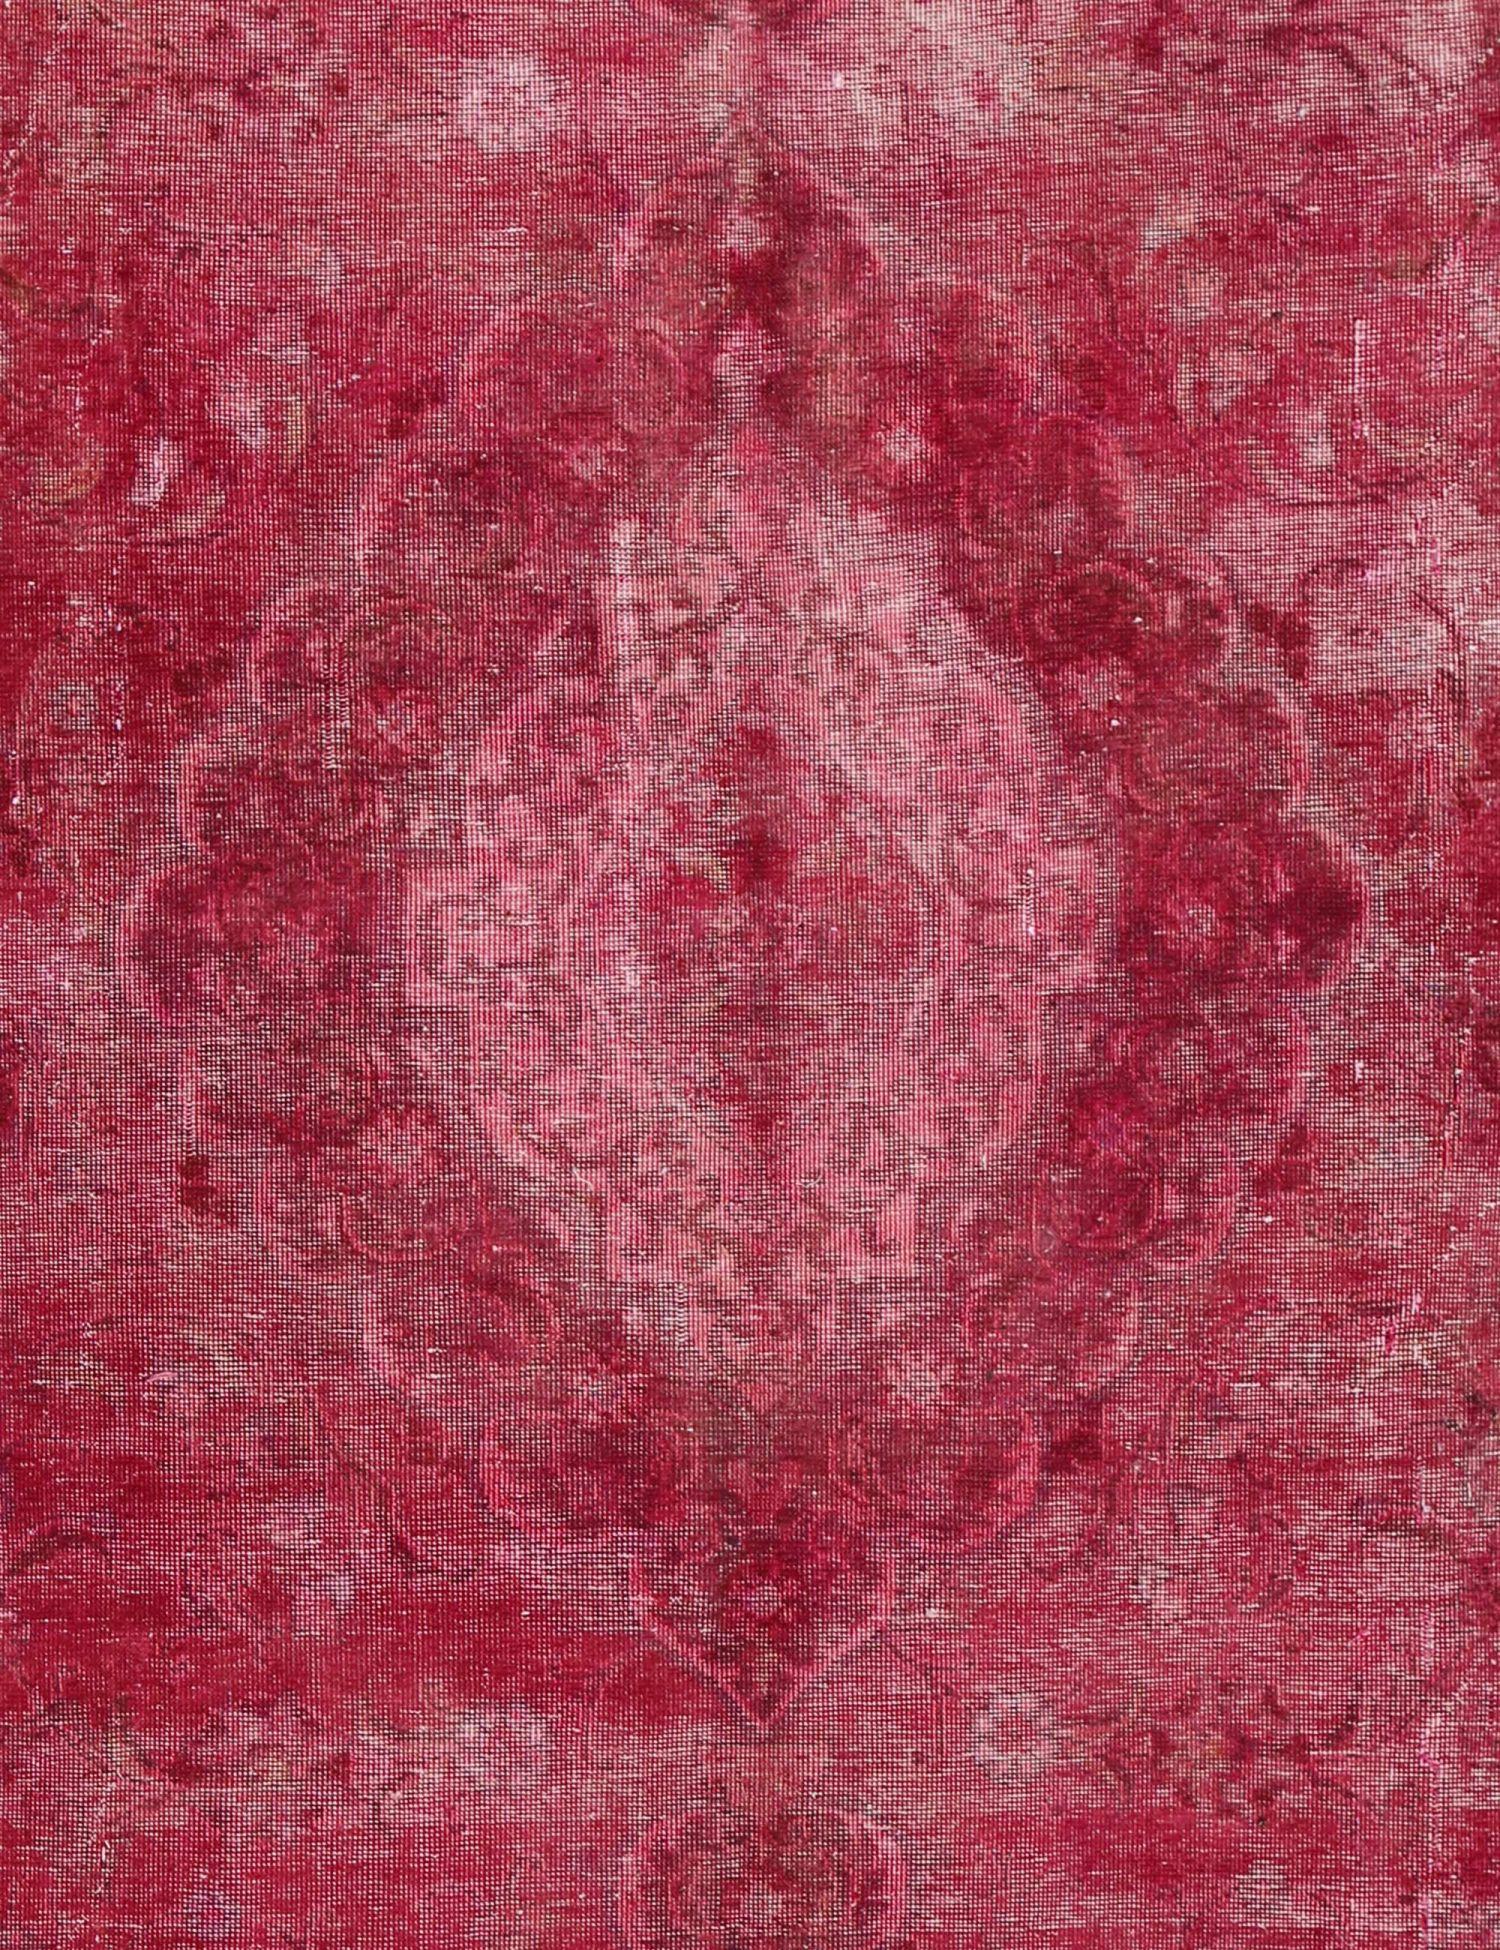 Tappeto Vintage  rosso <br/>287 x 185 cm